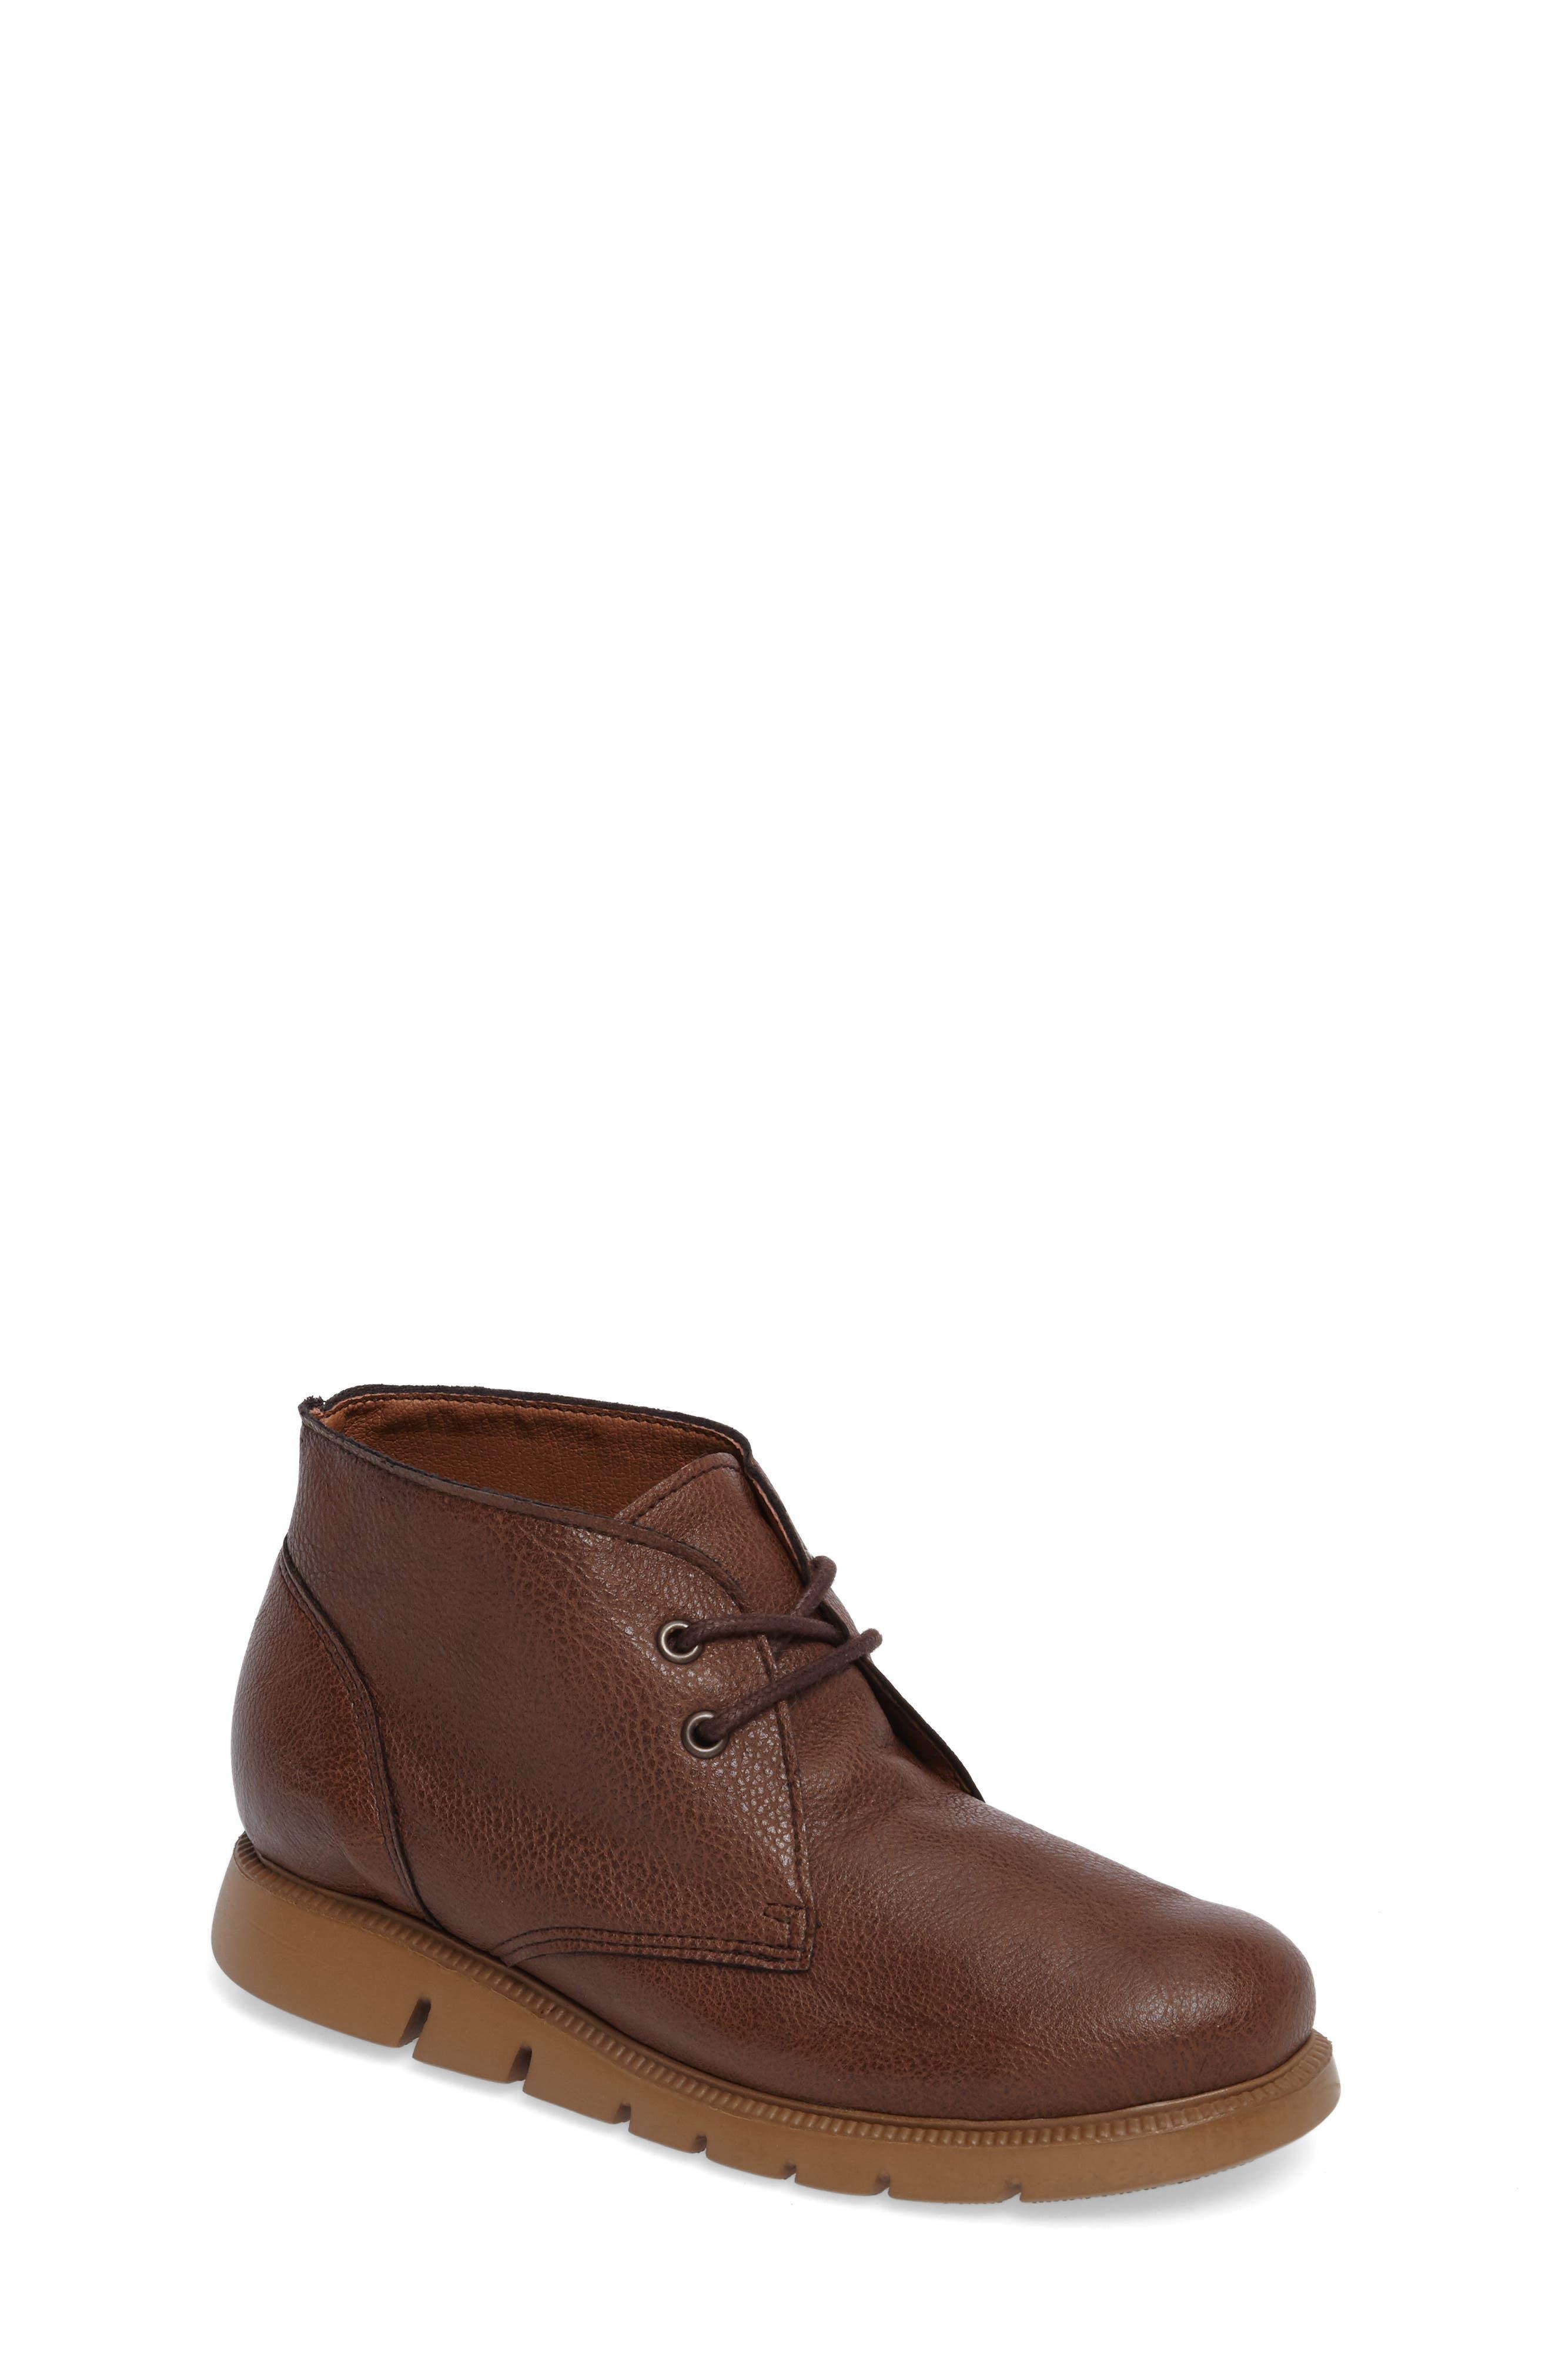 Weslie Chukka Boot,                         Main,                         color, Dark Tan